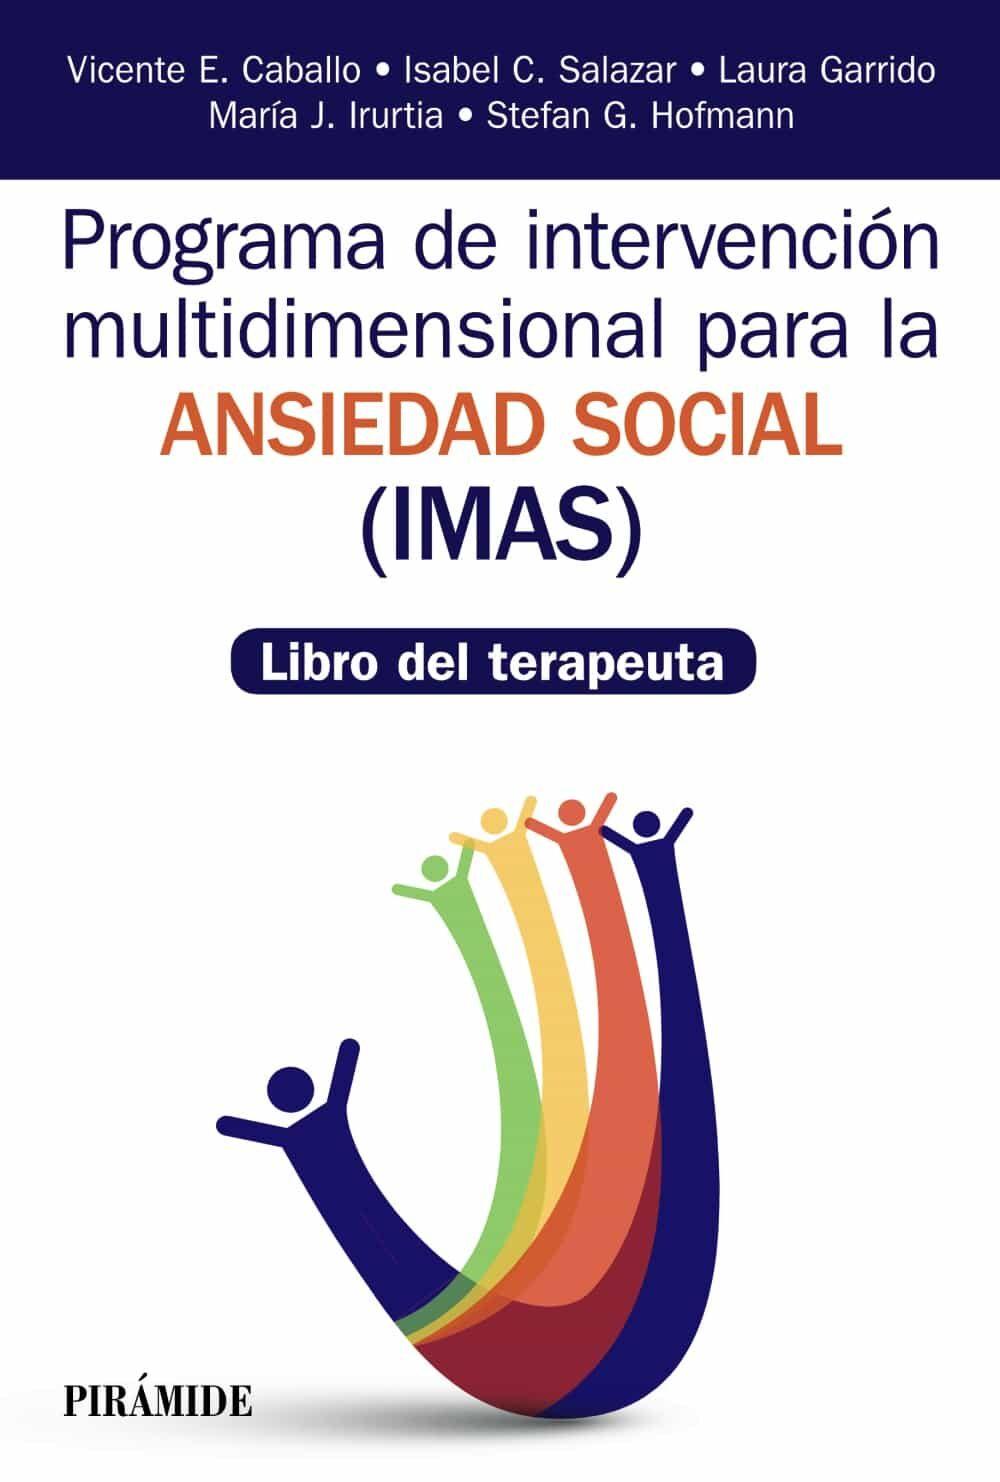 Programa De Intervención Multidimensional Para La Ansiedad Social (imas) por Vicente E. Caballo Manrique;                                                           Isabel C. Salazar